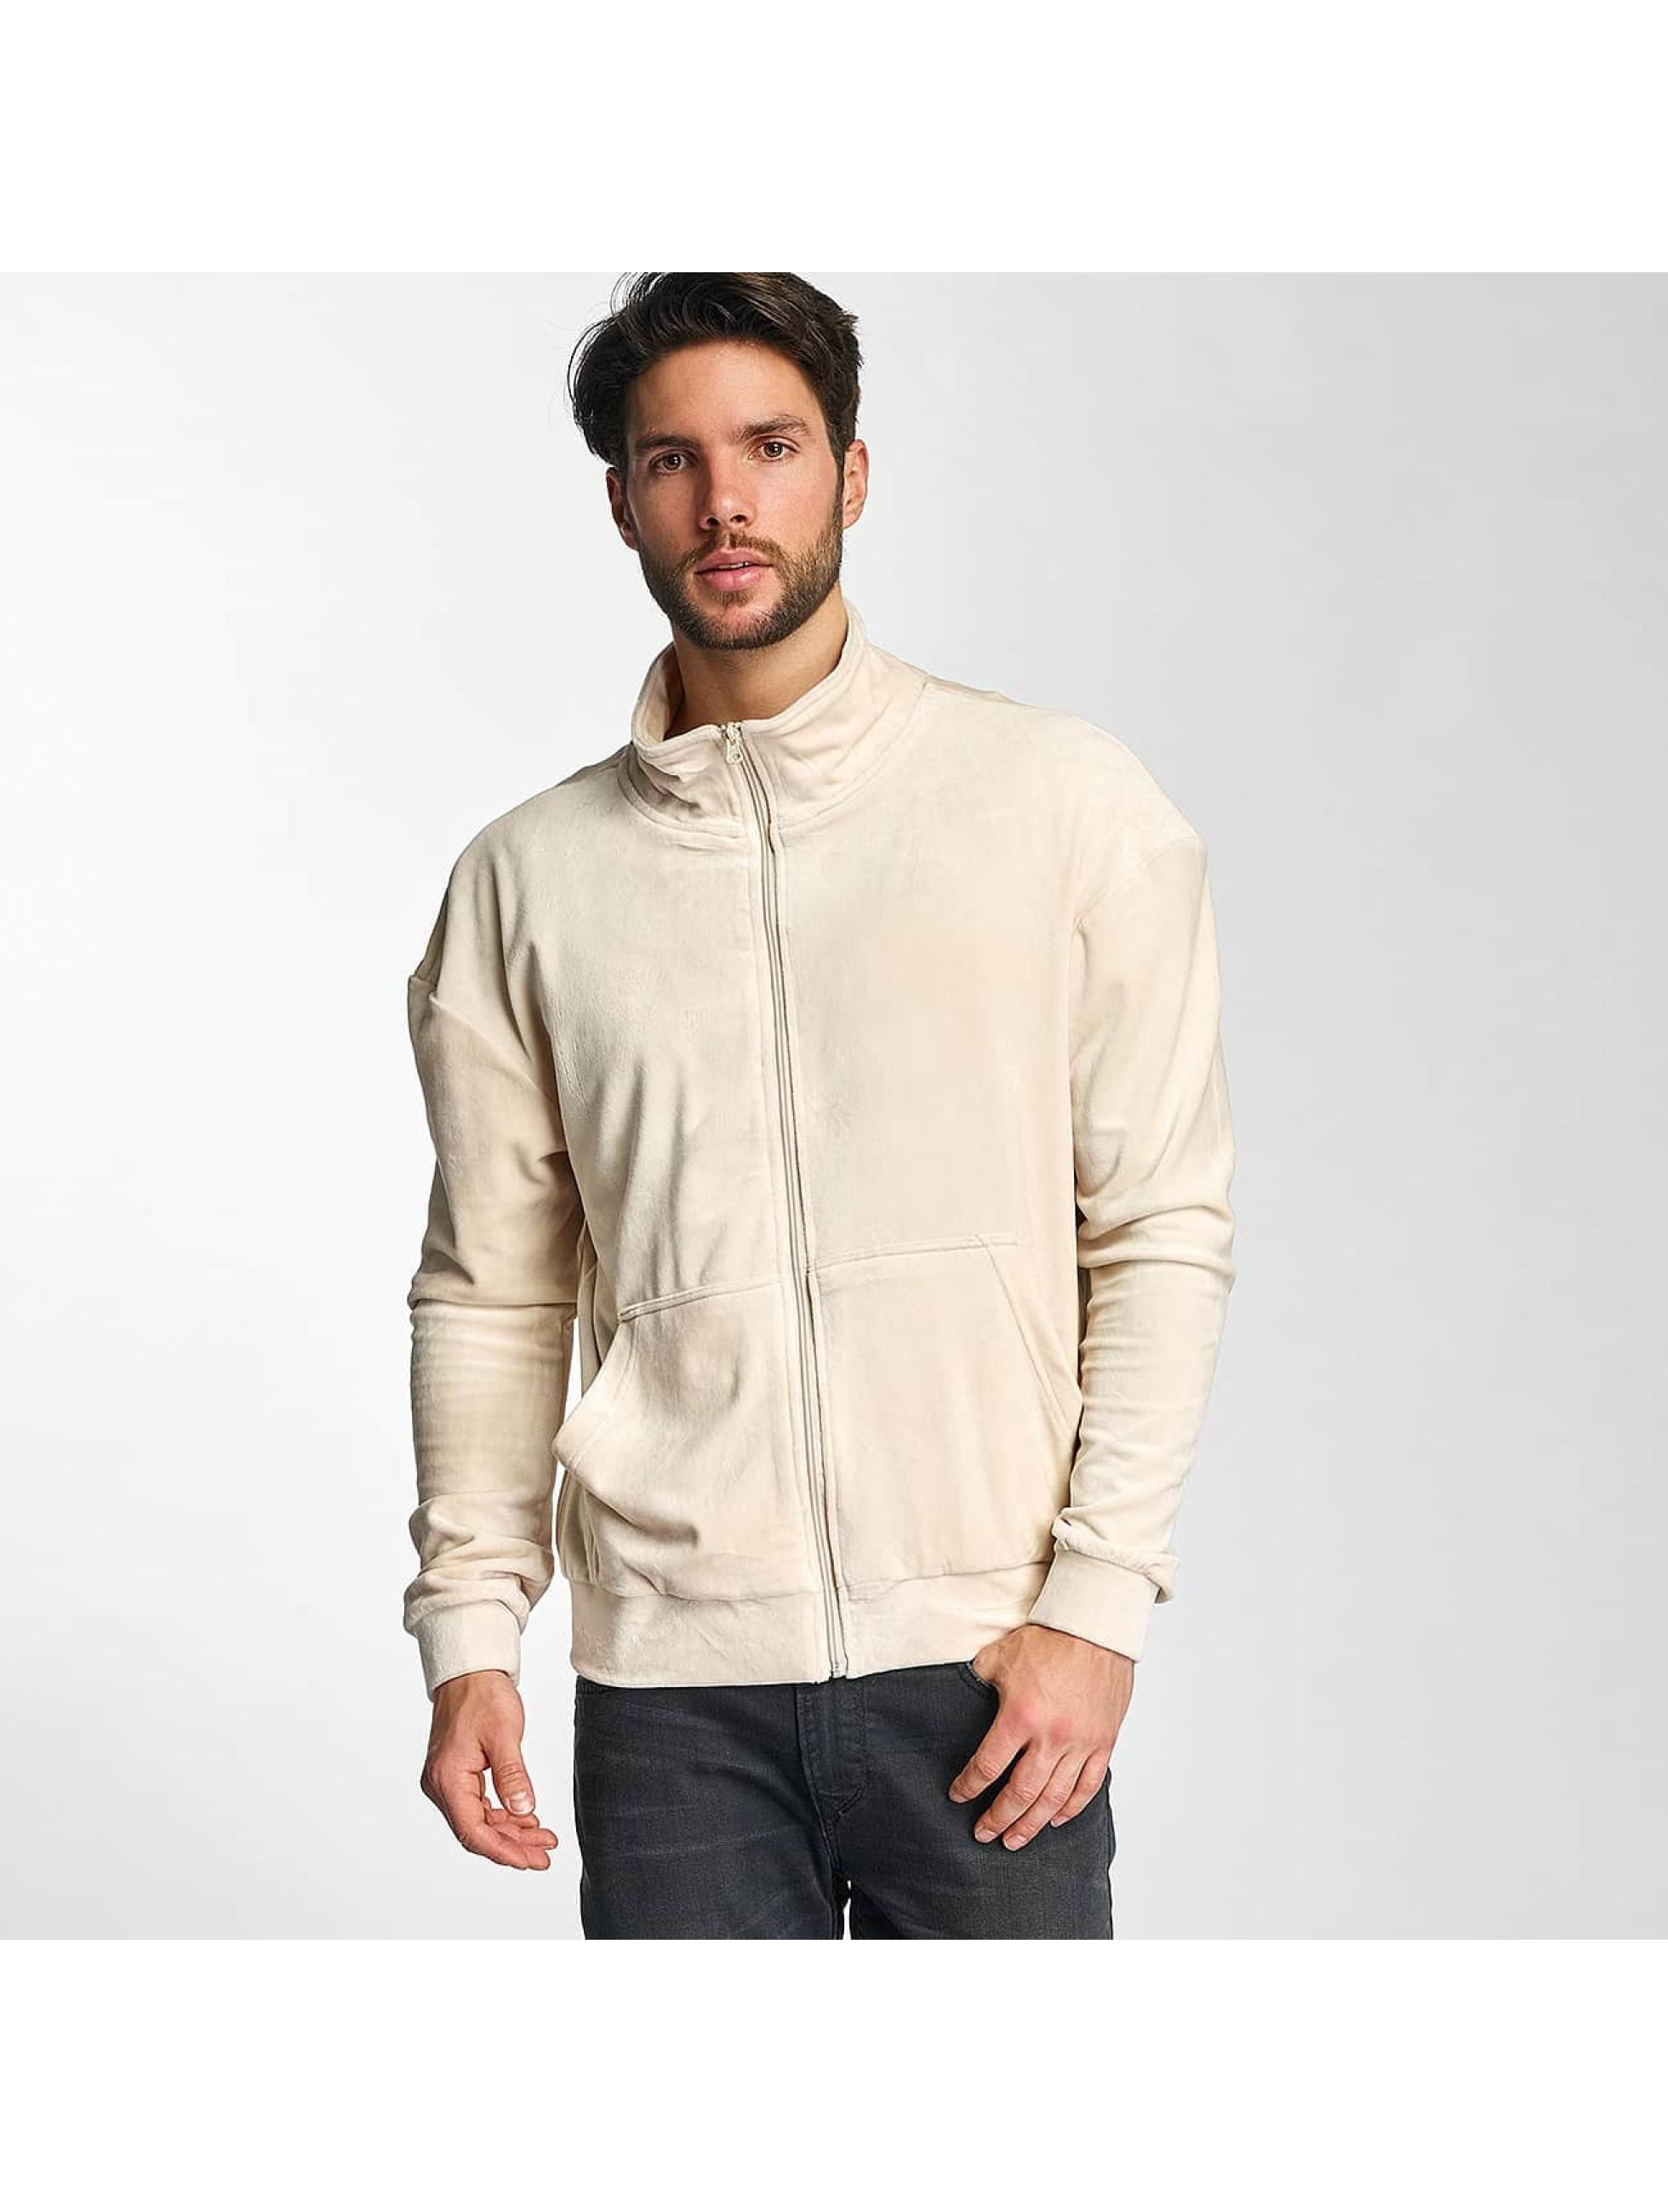 Urban Classics Lightweight Jacket Velvet beige